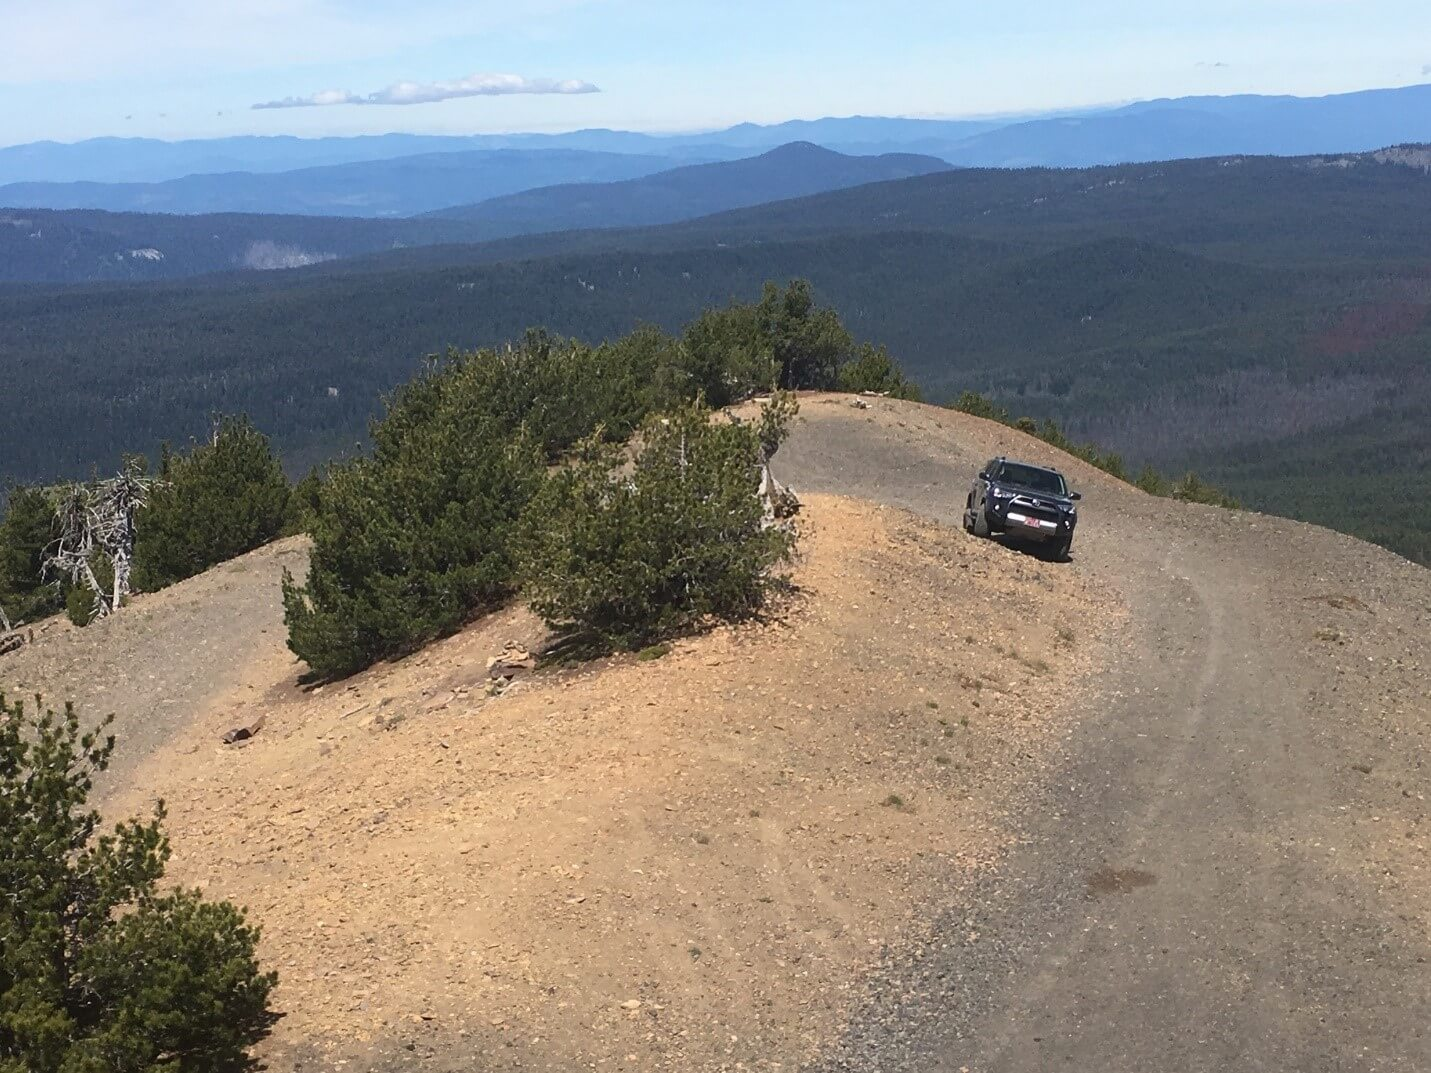 Pelican Butte 4x4 Trail - Parking